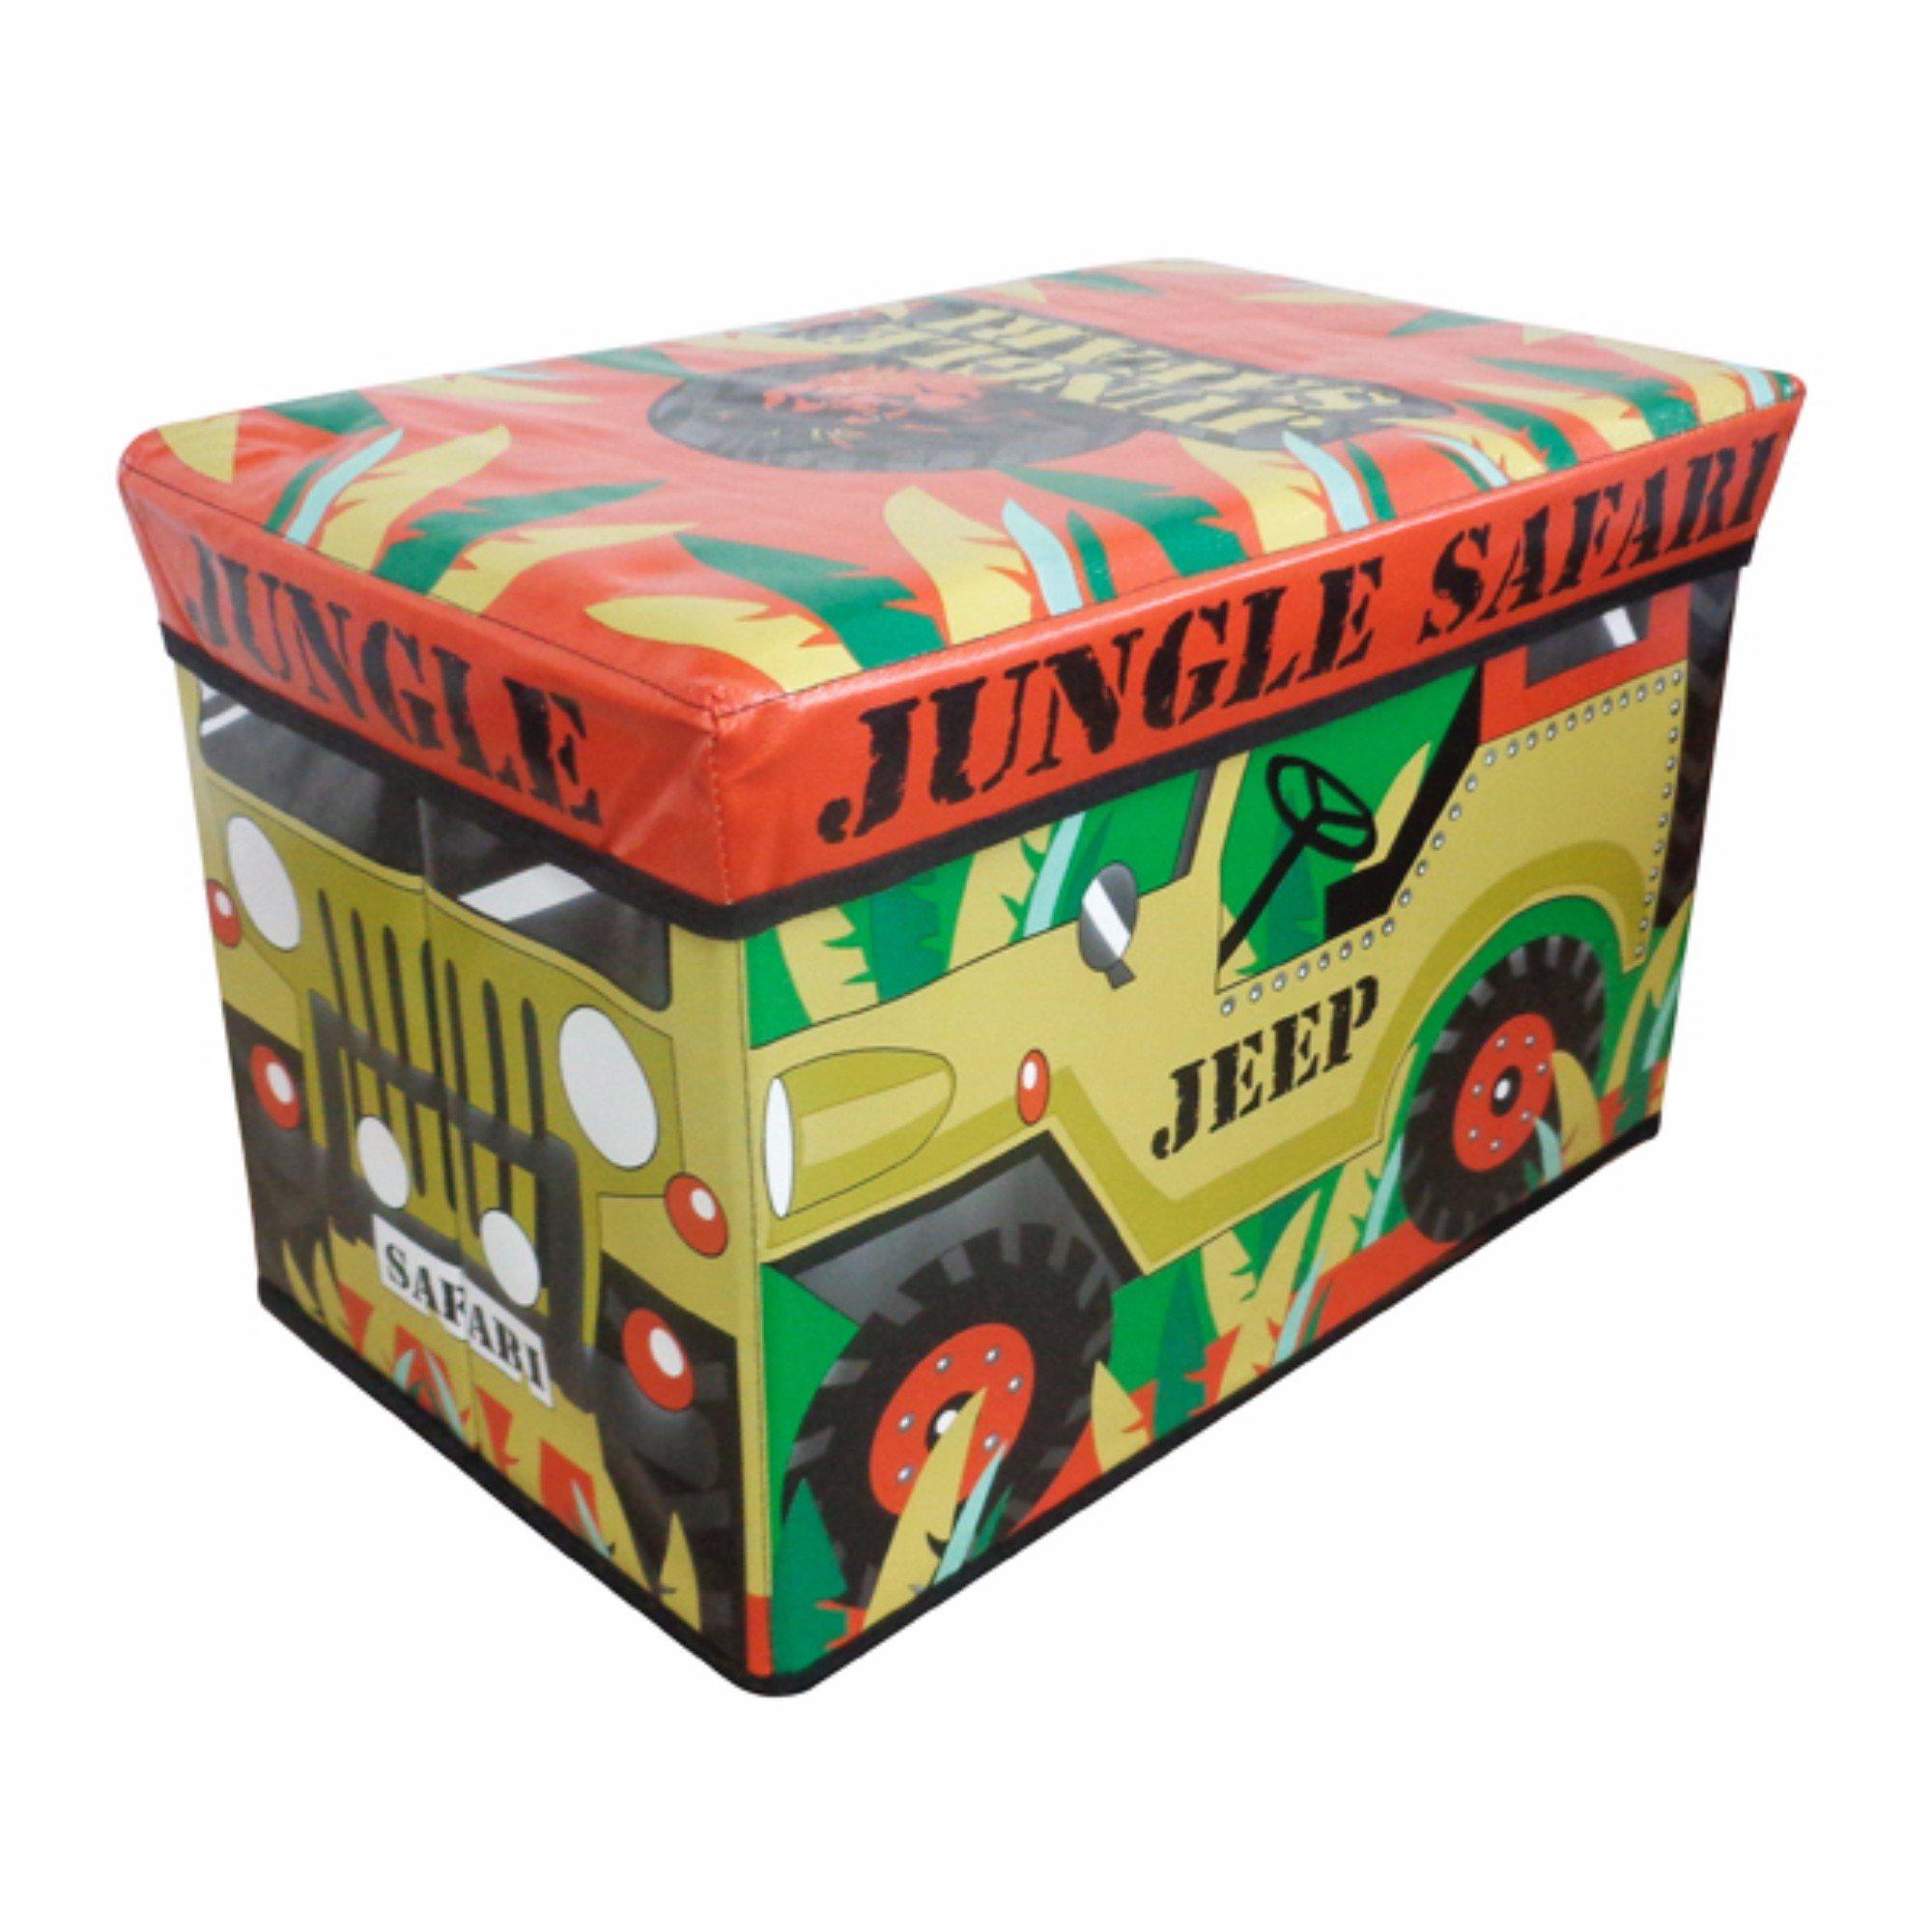 Universal Textiles Childrens/Girls Jeep Design Folding Storage Chest (One Size) (Jeep)